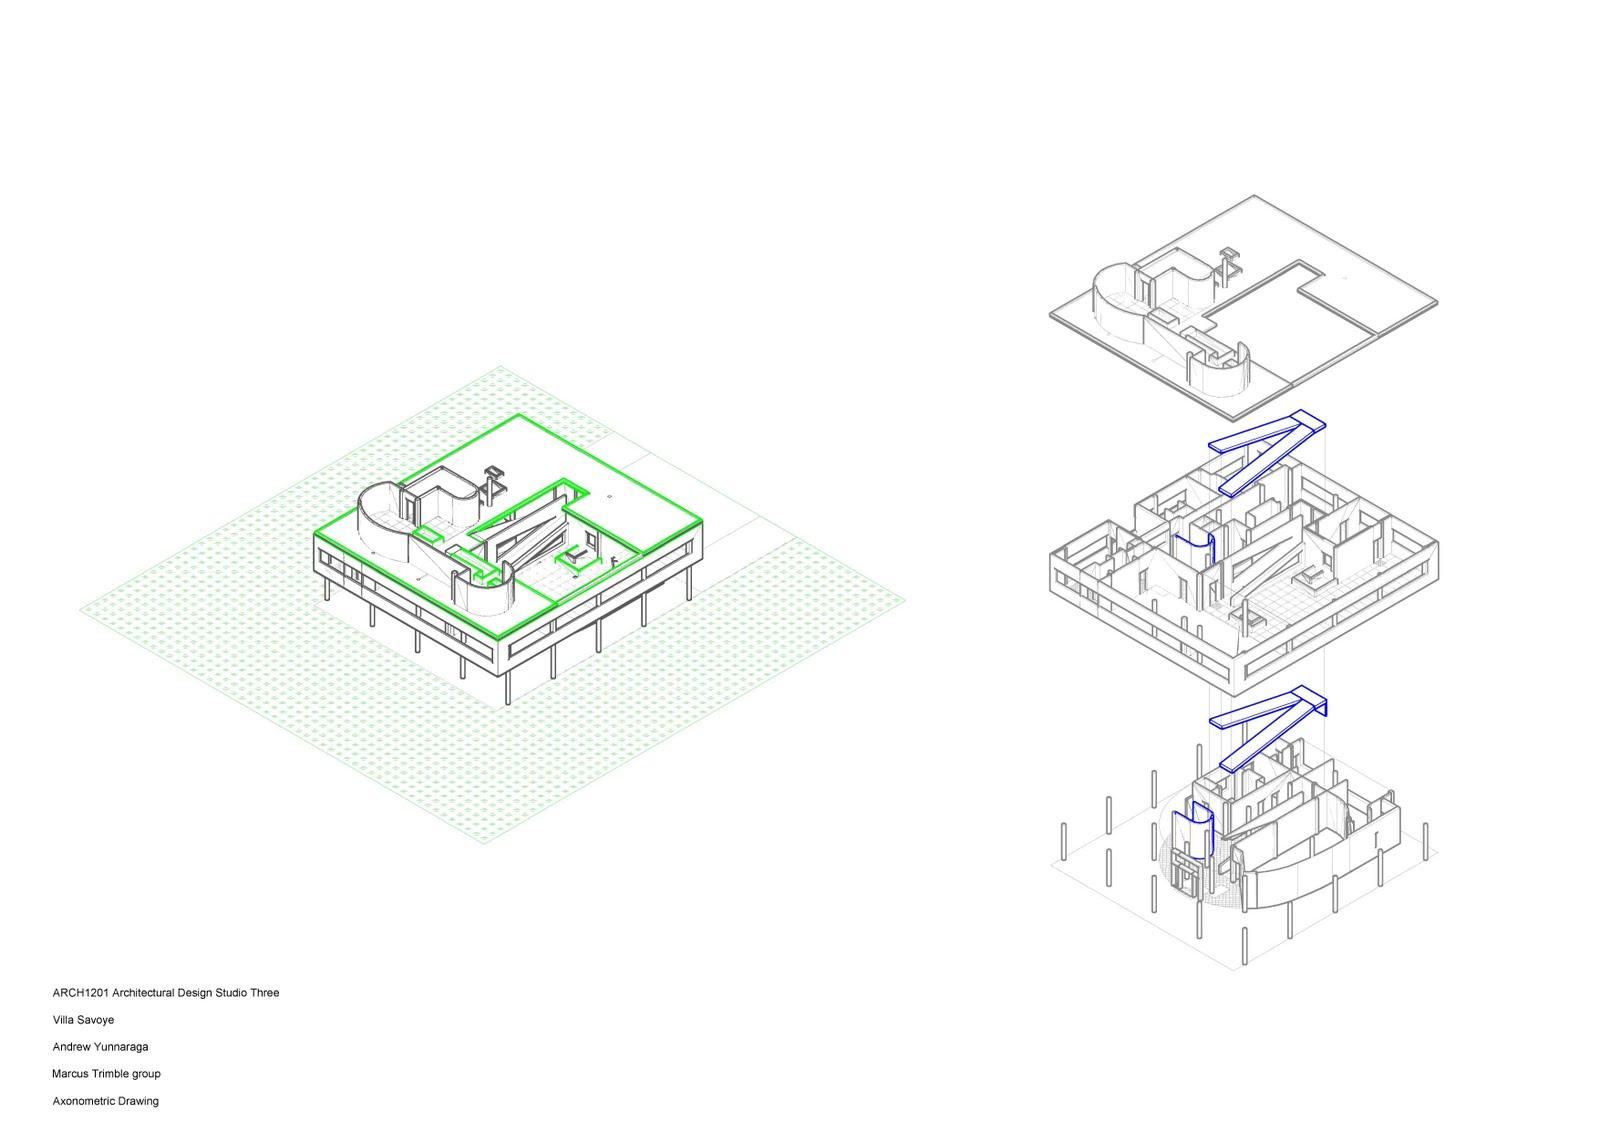 Villa Savoye Floor Plan Arch 1201 Architectural Design Studio 3 Project 1 Drawing